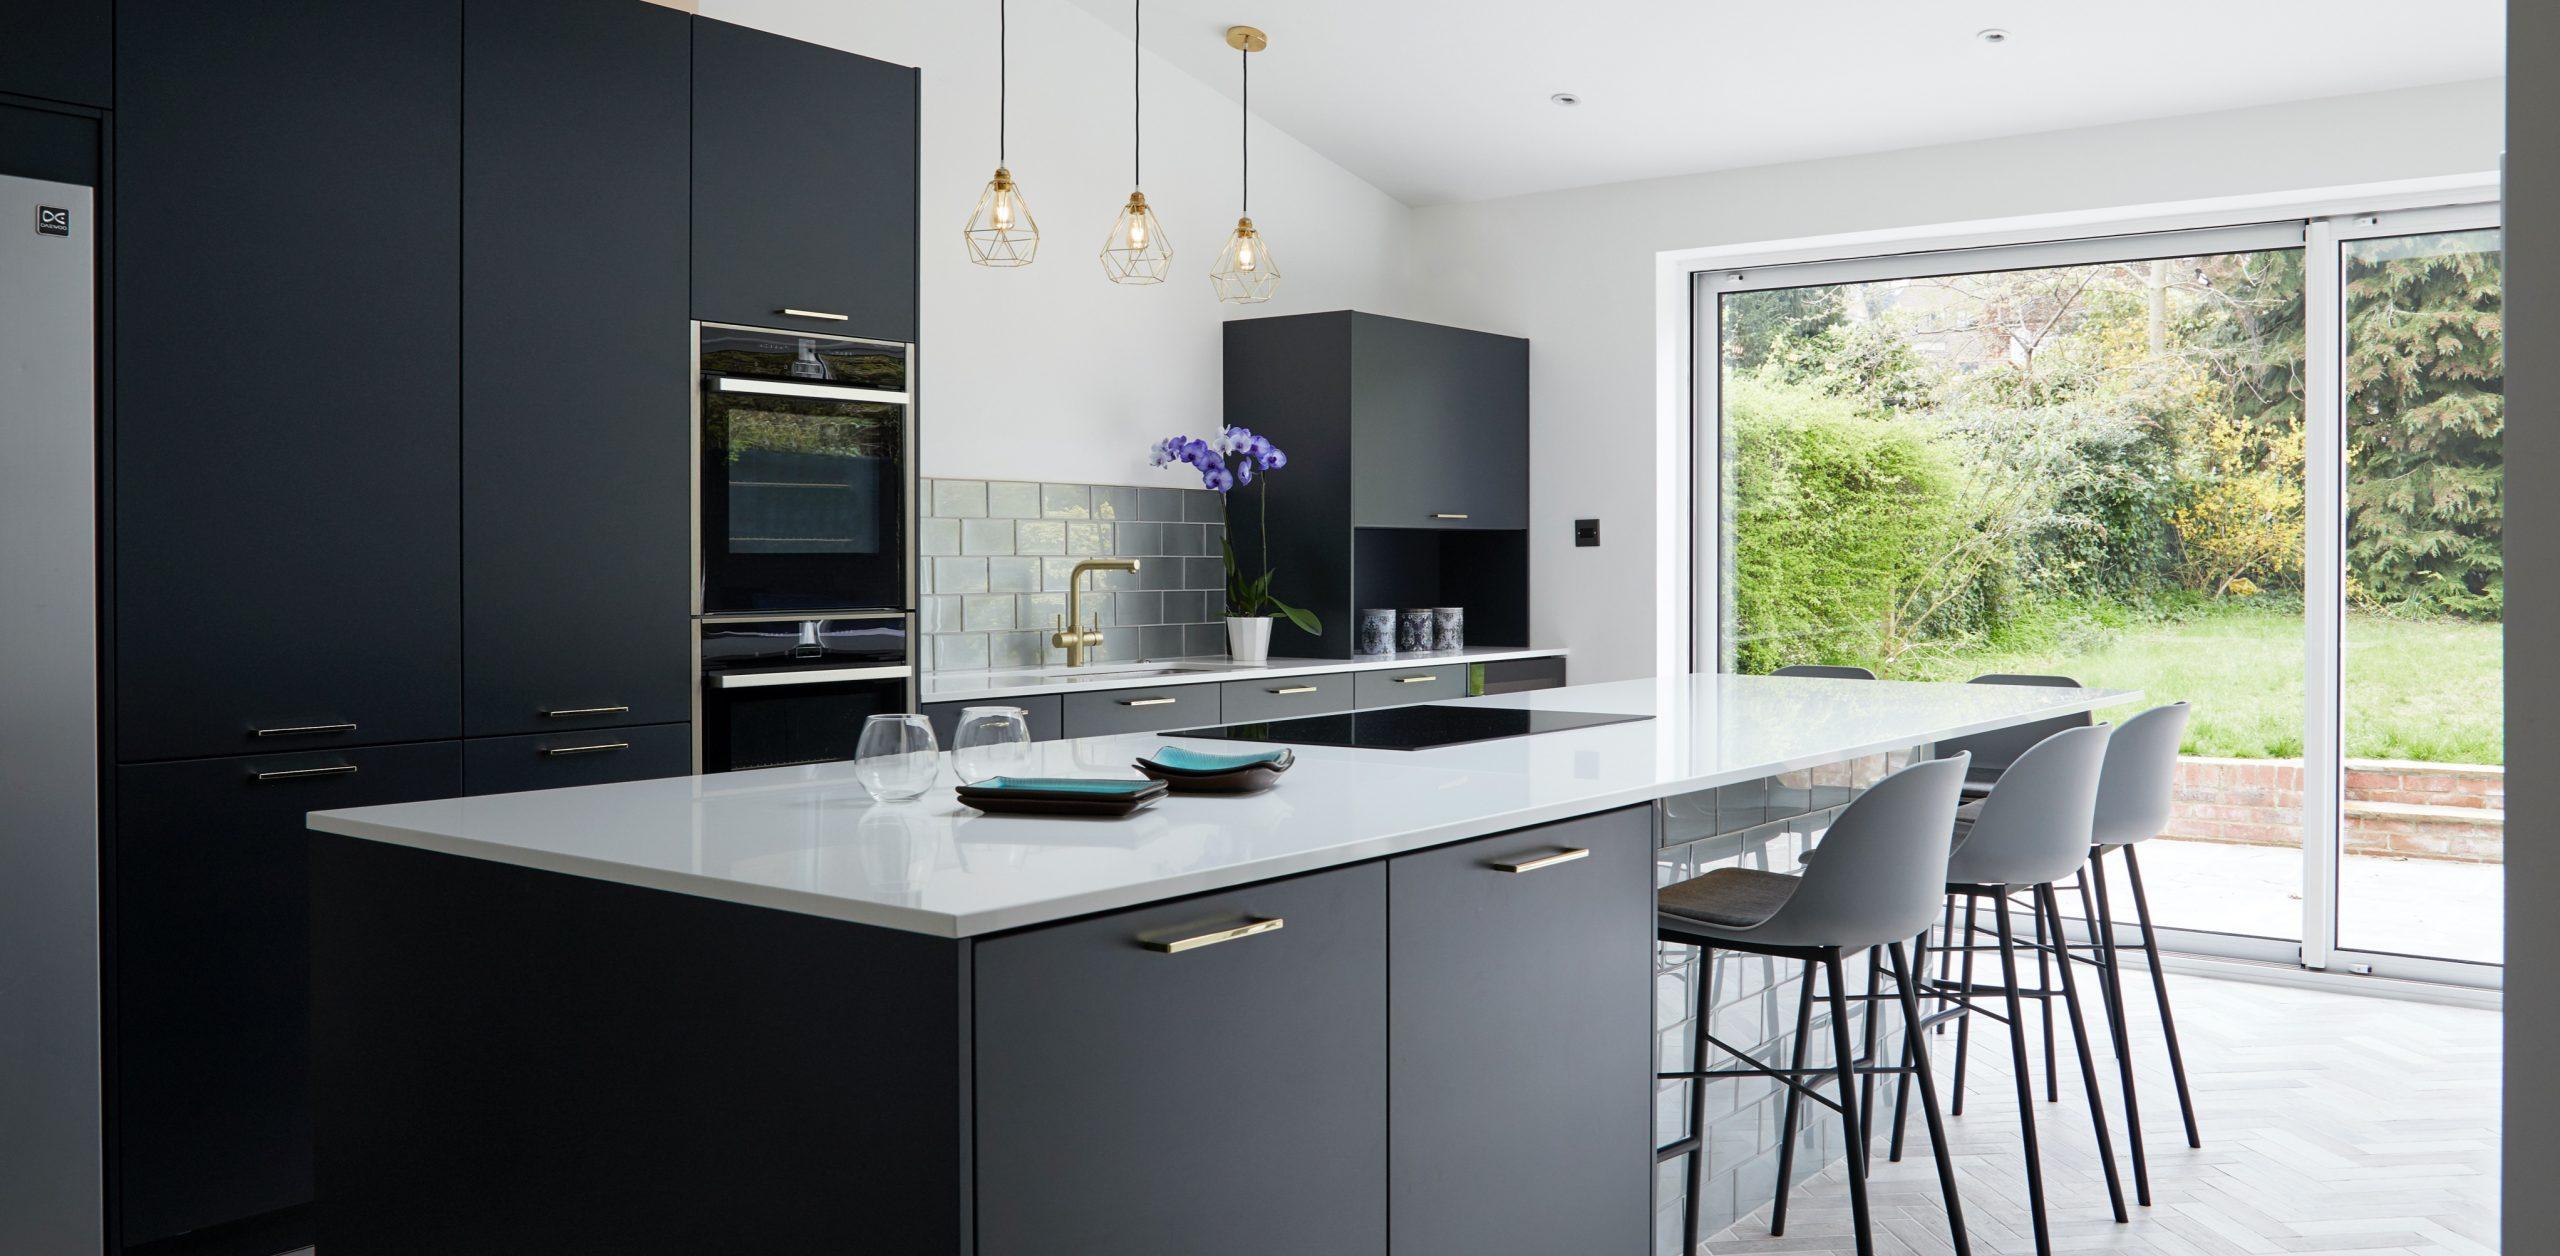 Inspiration Gallery Slab Style Kitchen Cabinets